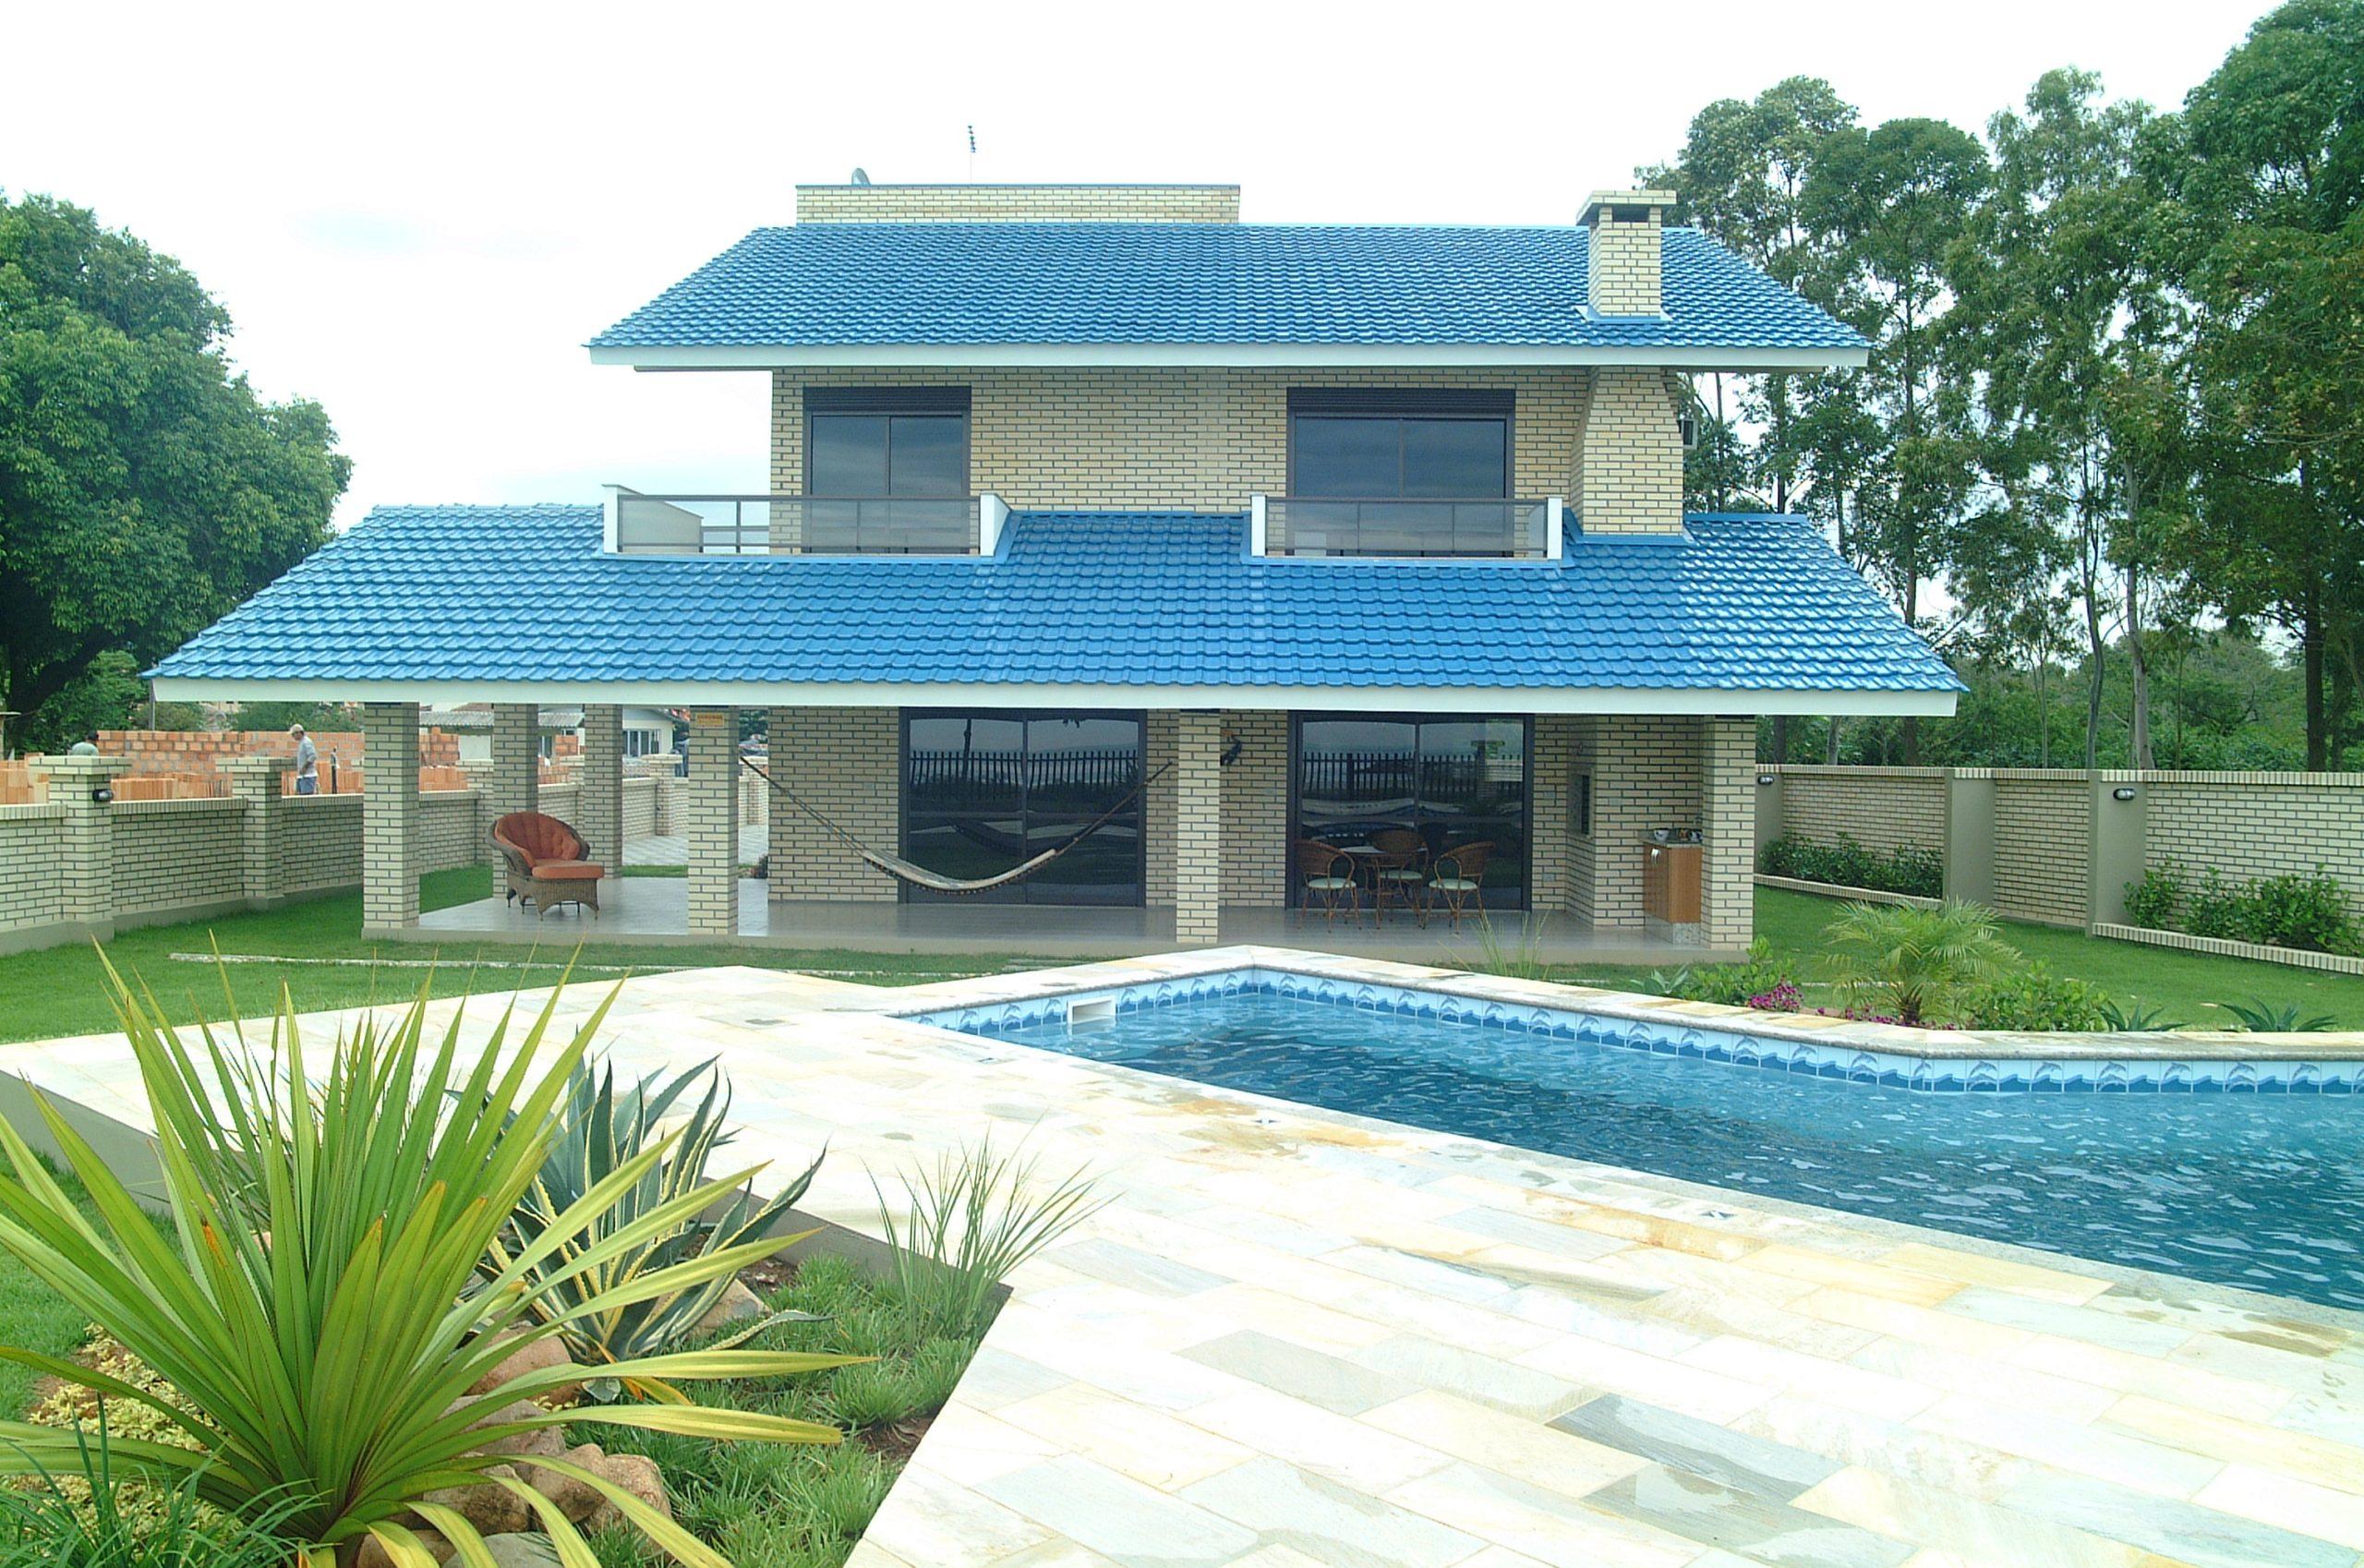 PJV Arquitetura - Casa Teixeira